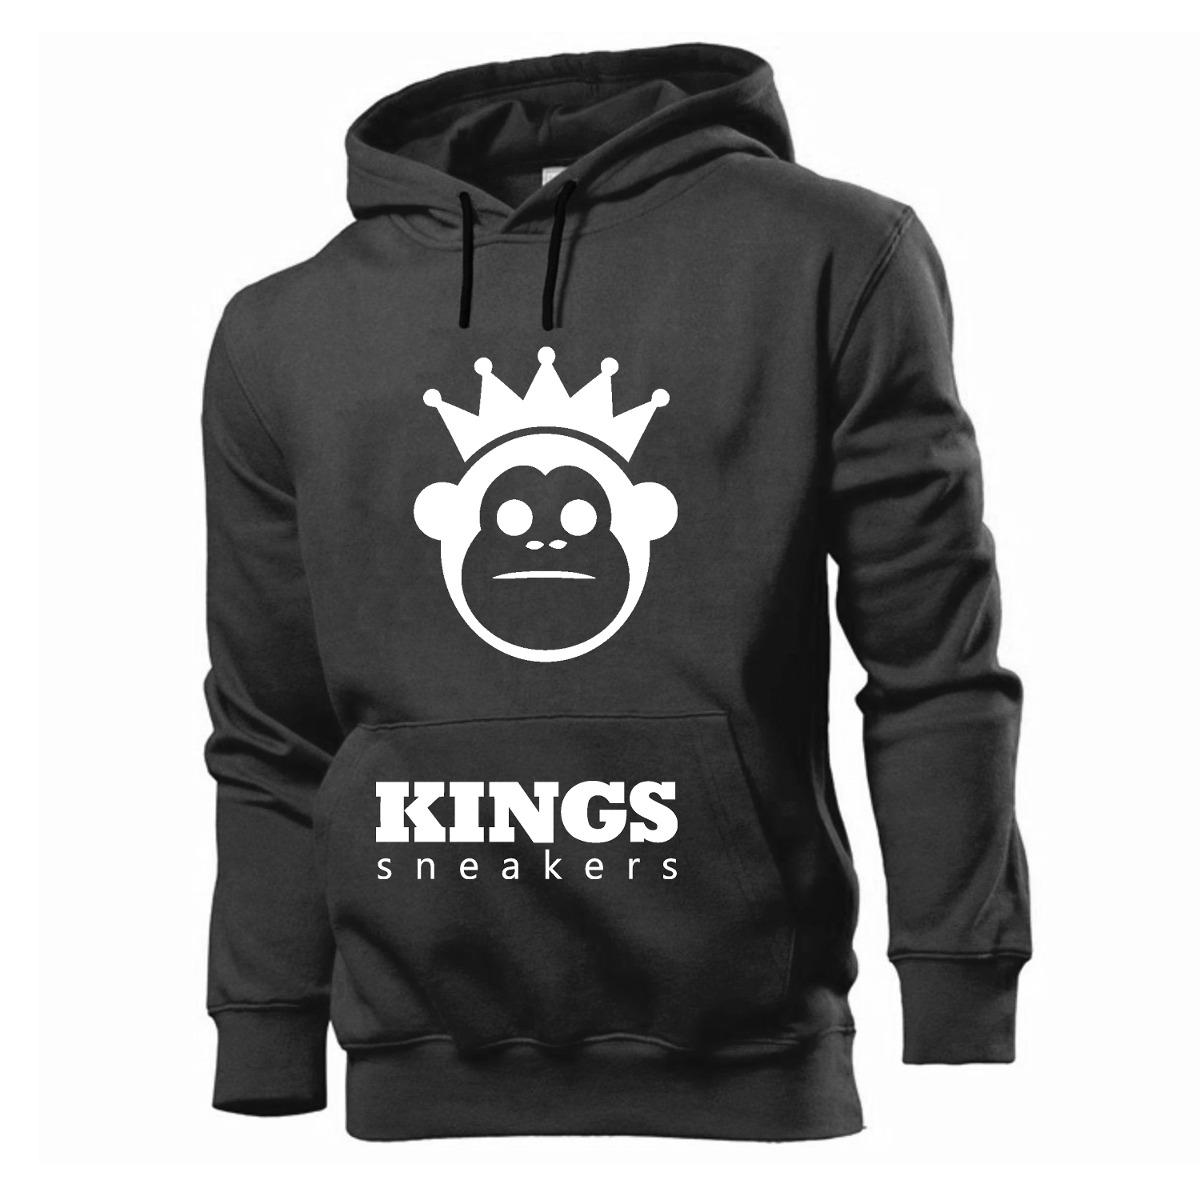 Moletom Kings Sneakers Skate Moda Bolsos Capuz 2019 - R  59 8d9904aee93